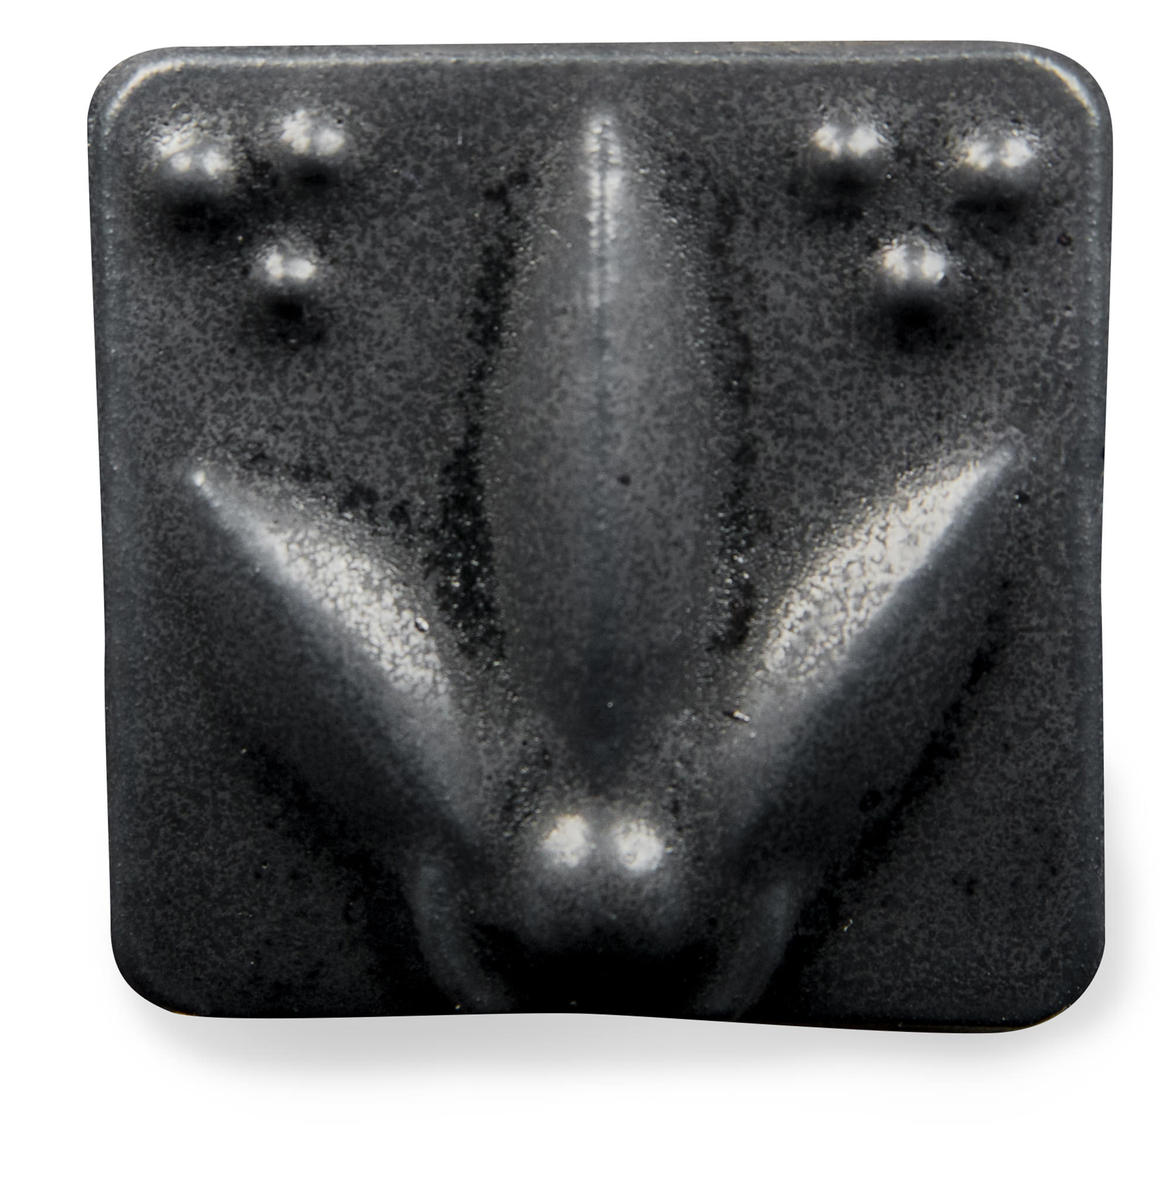 venta de esmalte para ceramica amaco satin matte SM-1 black alta temperatura